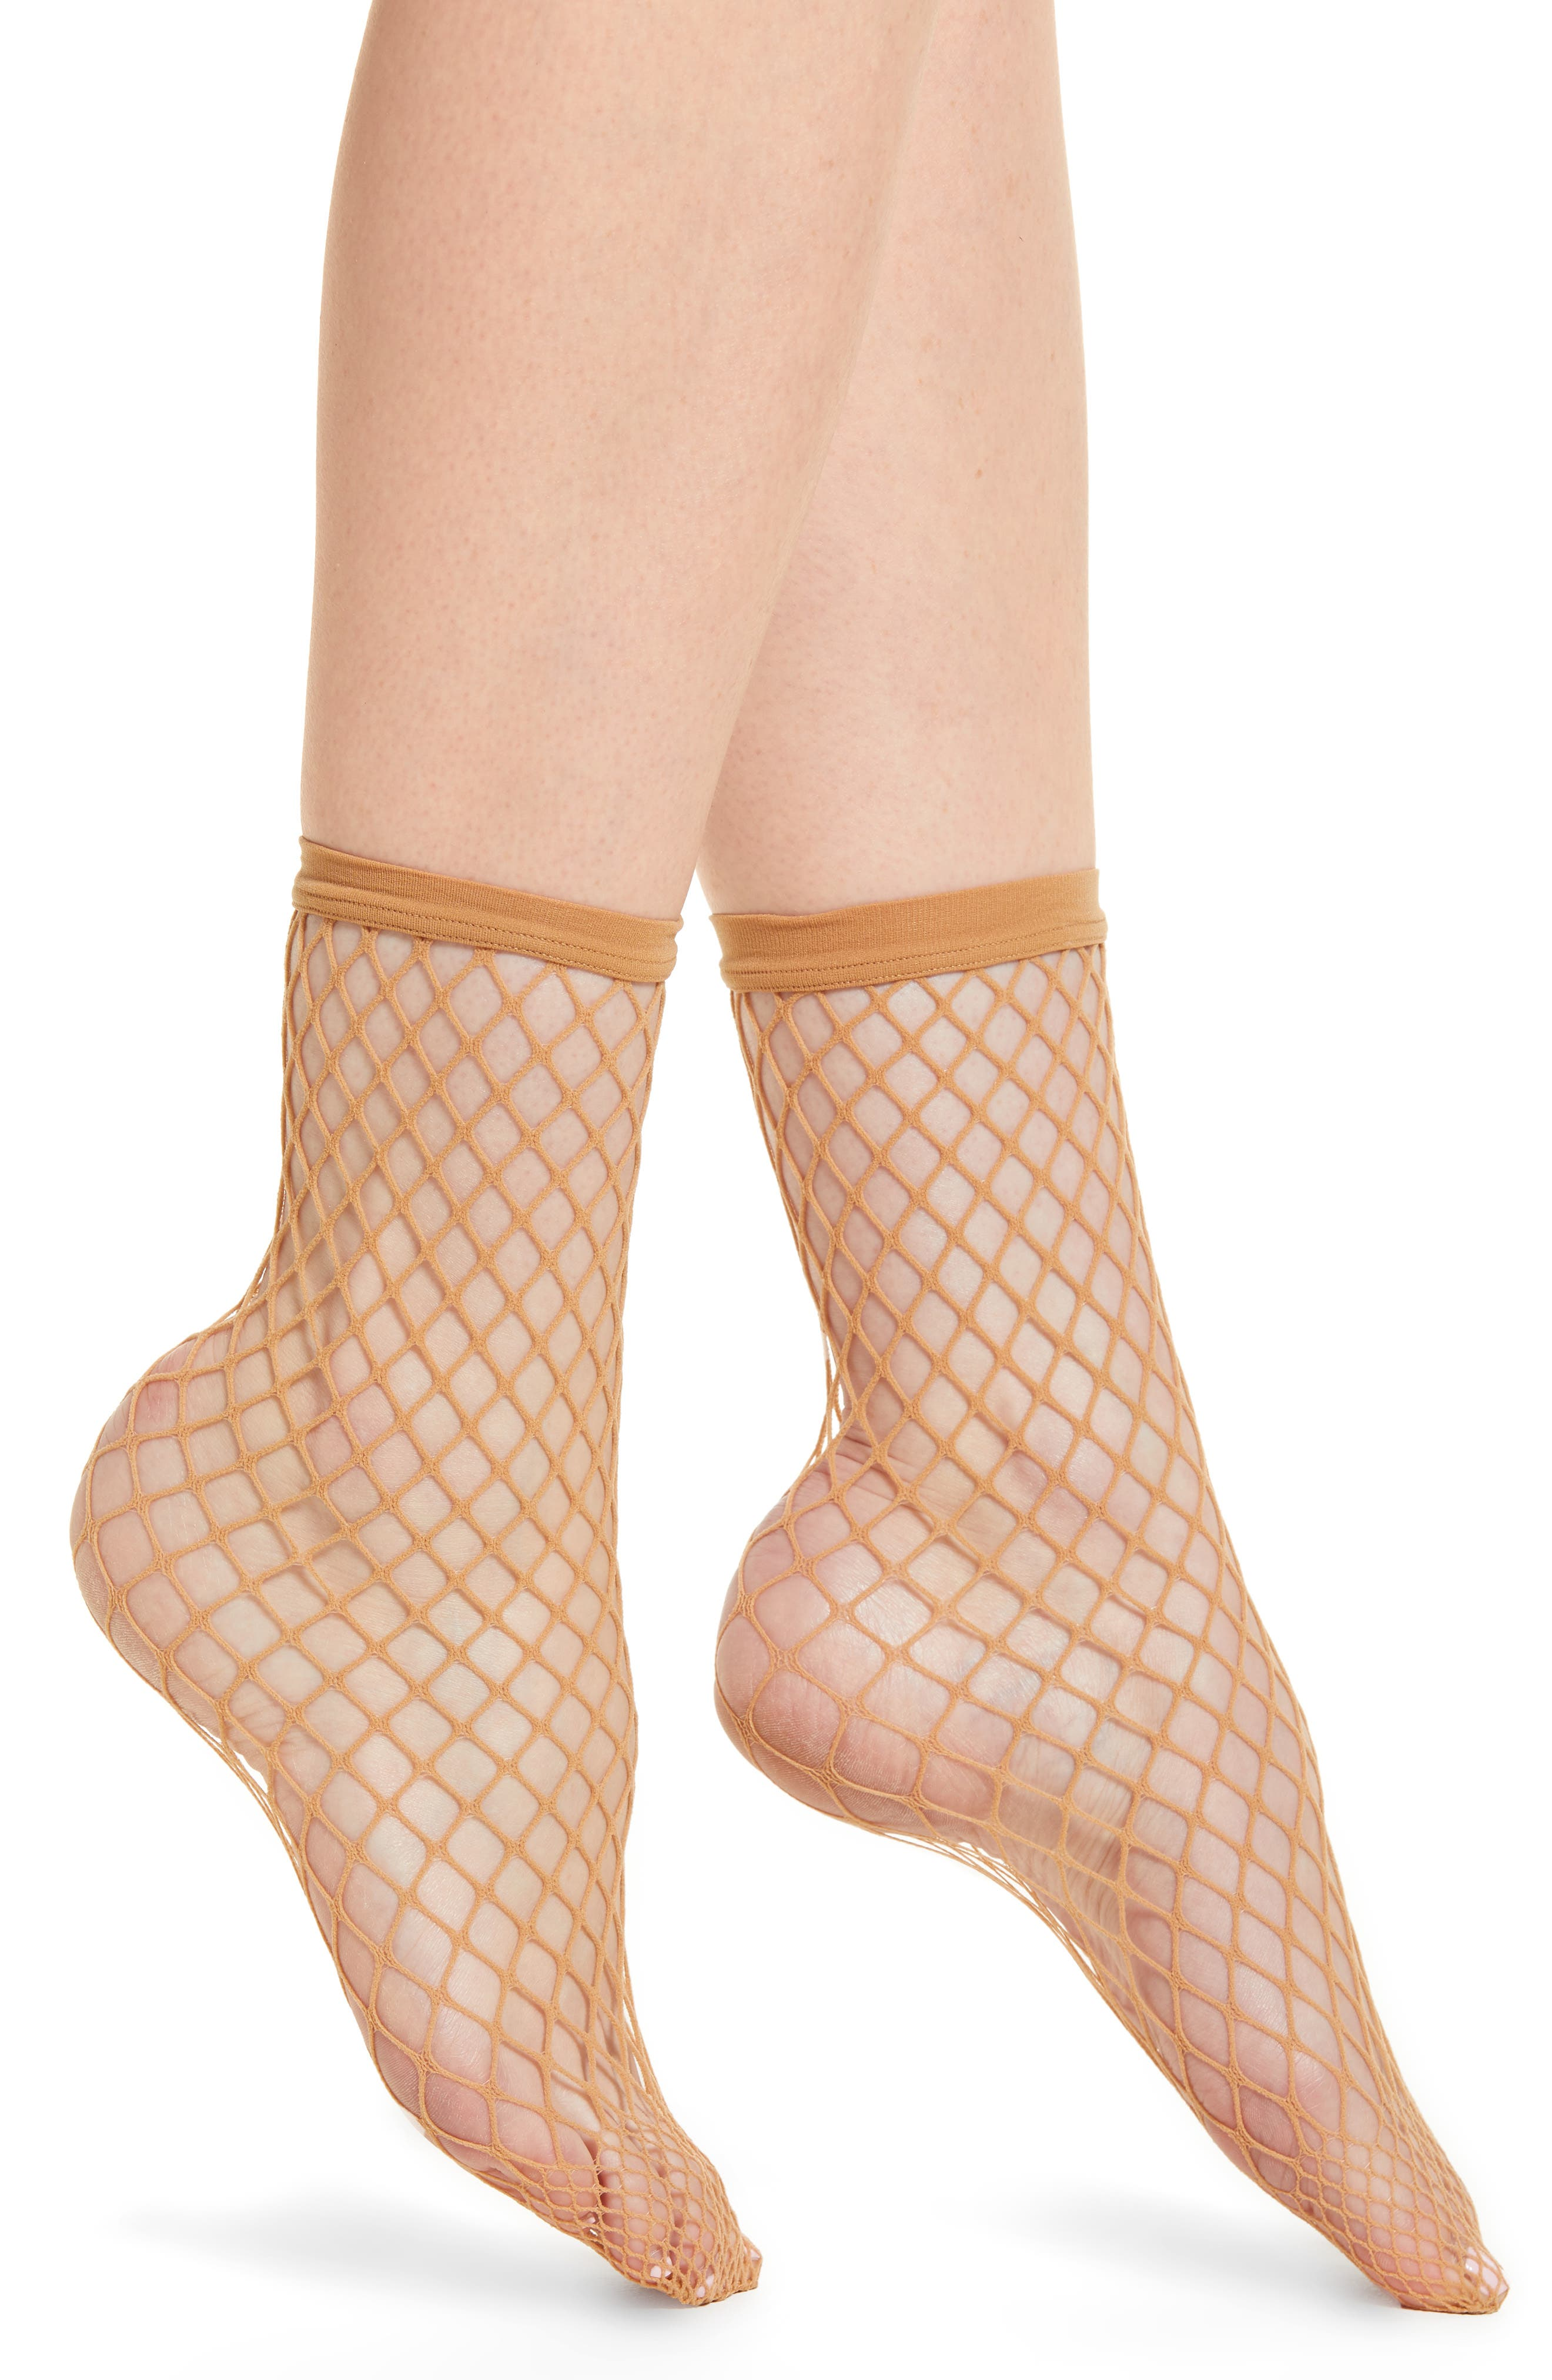 Tina Summer Net Ankle Socks,                             Main thumbnail 1, color,                             Gobi